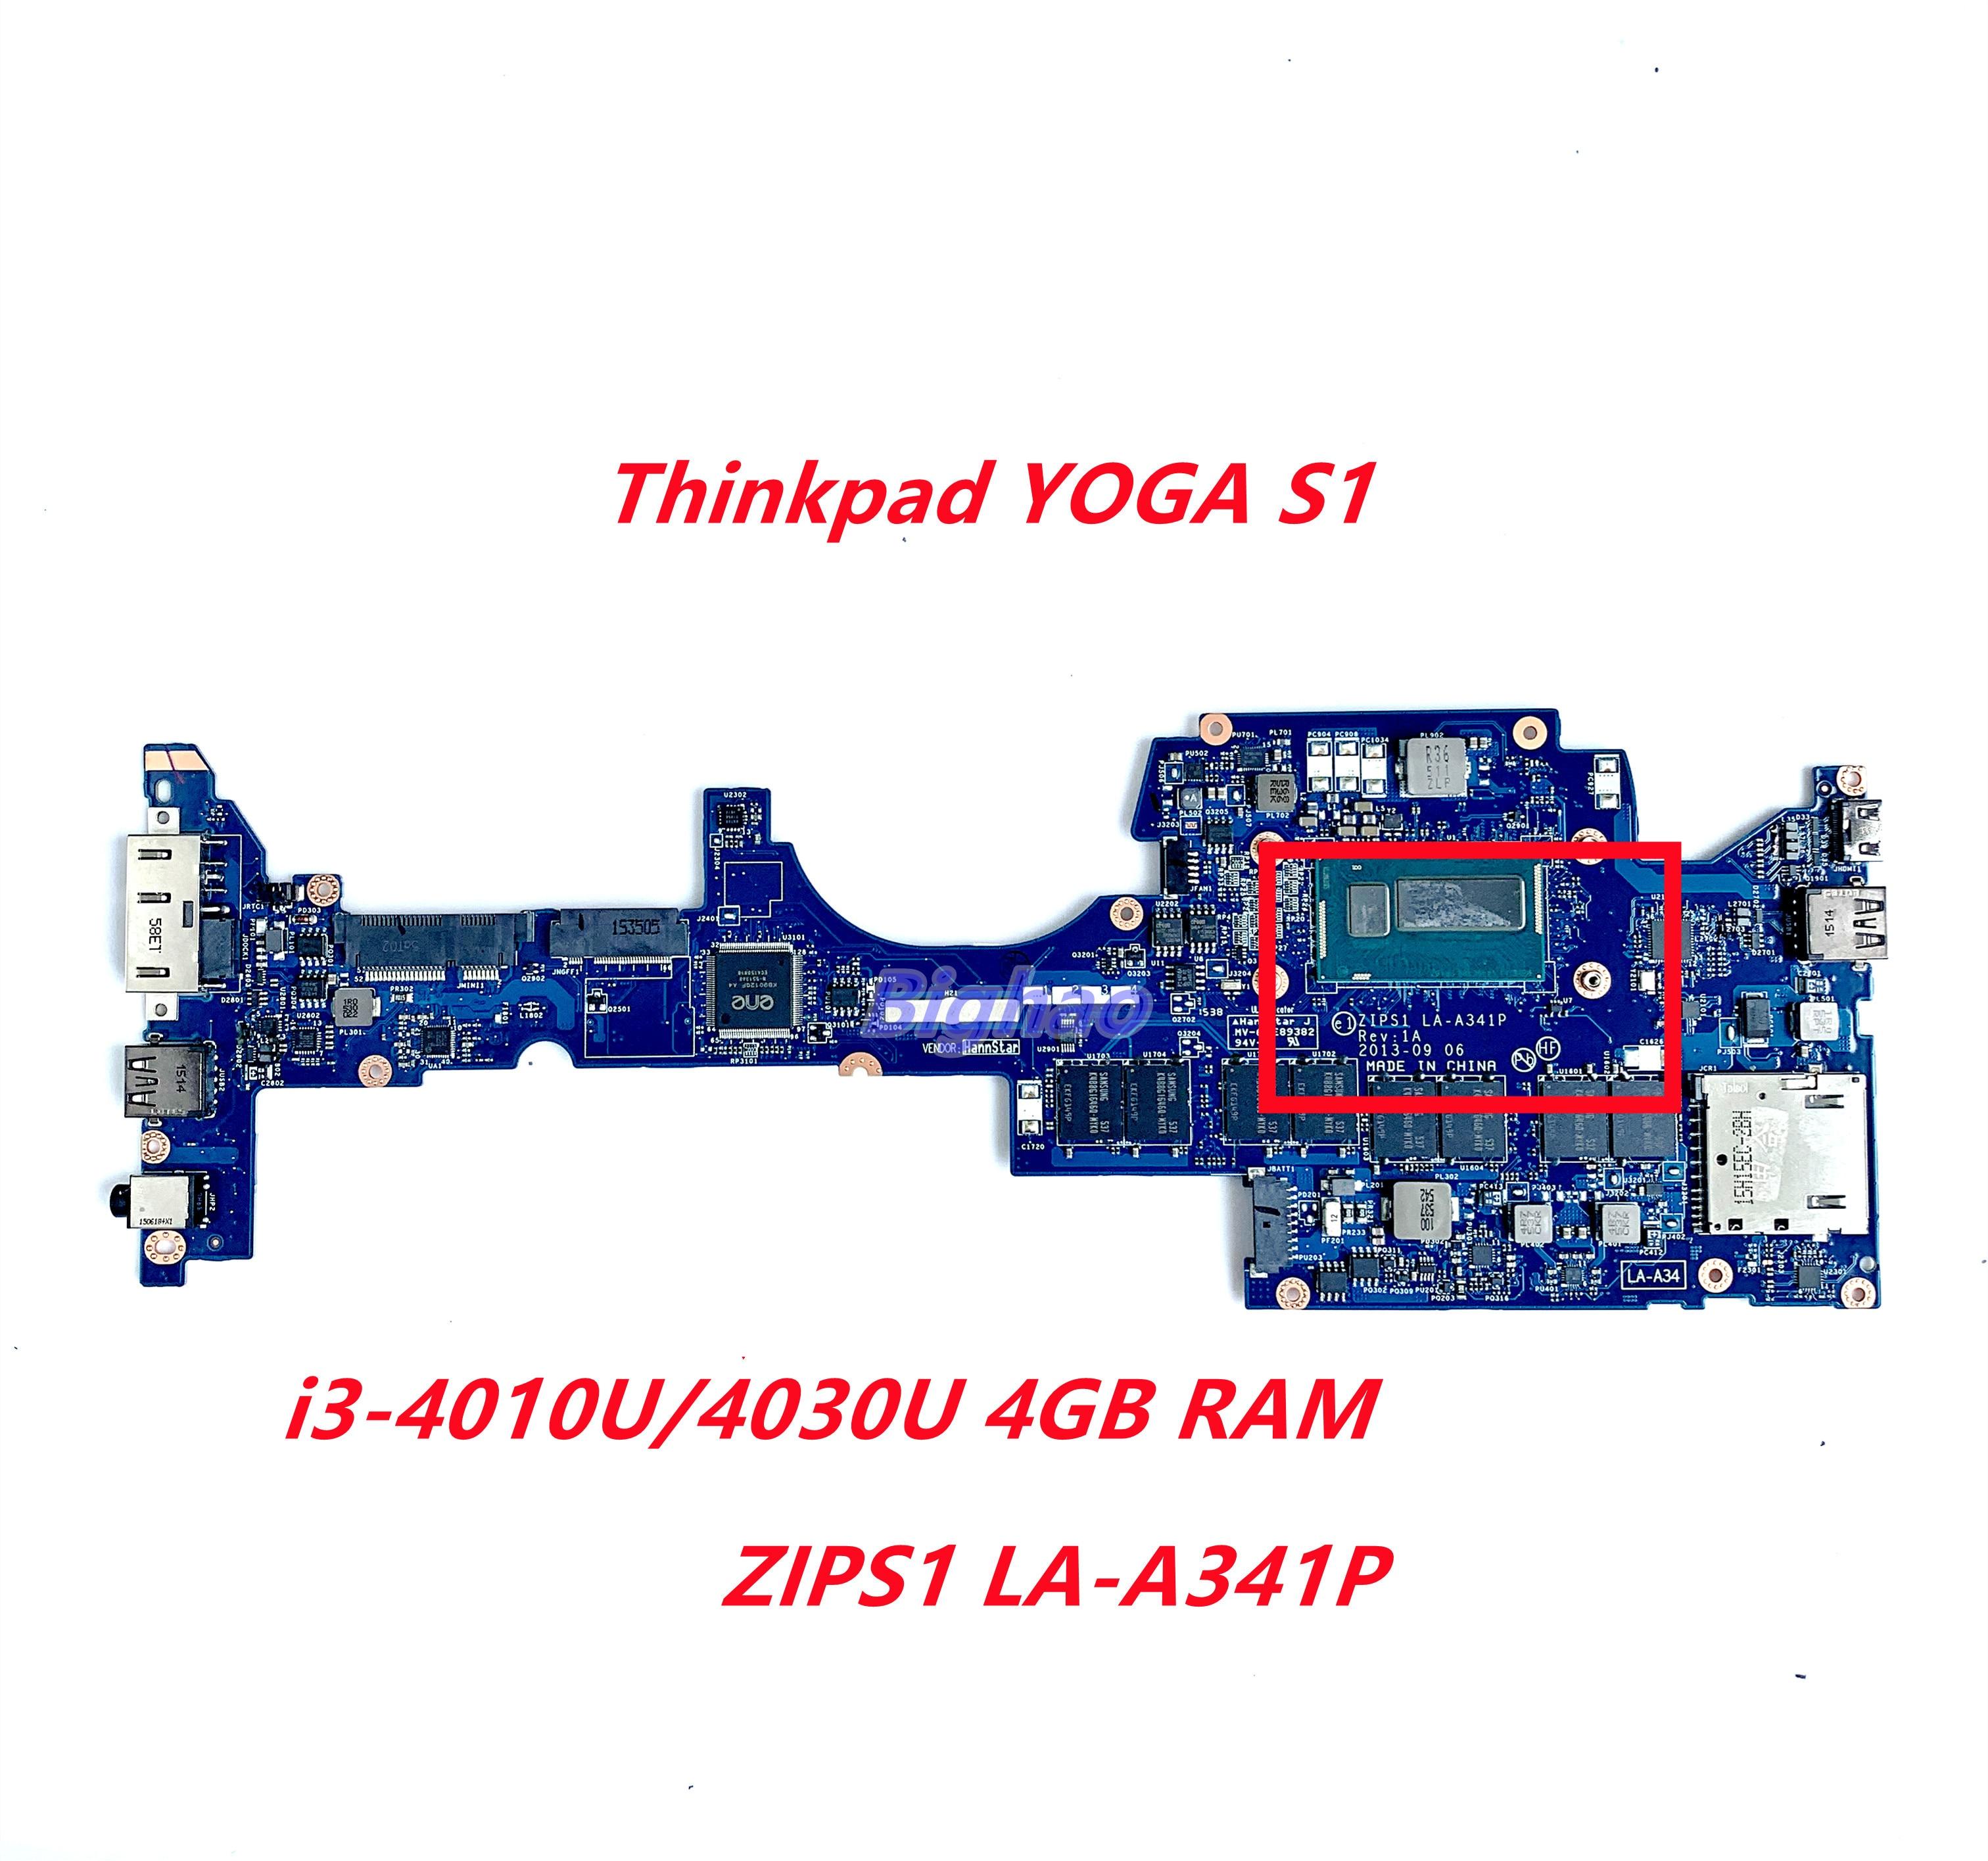 Zip S1 LA-A341P لينوفو ثينك باد اليوغا S1 اللوحة الأم للكمبيوتر المحمول I3-4010U/4030U 4GB RAM 100% اختبار العمل